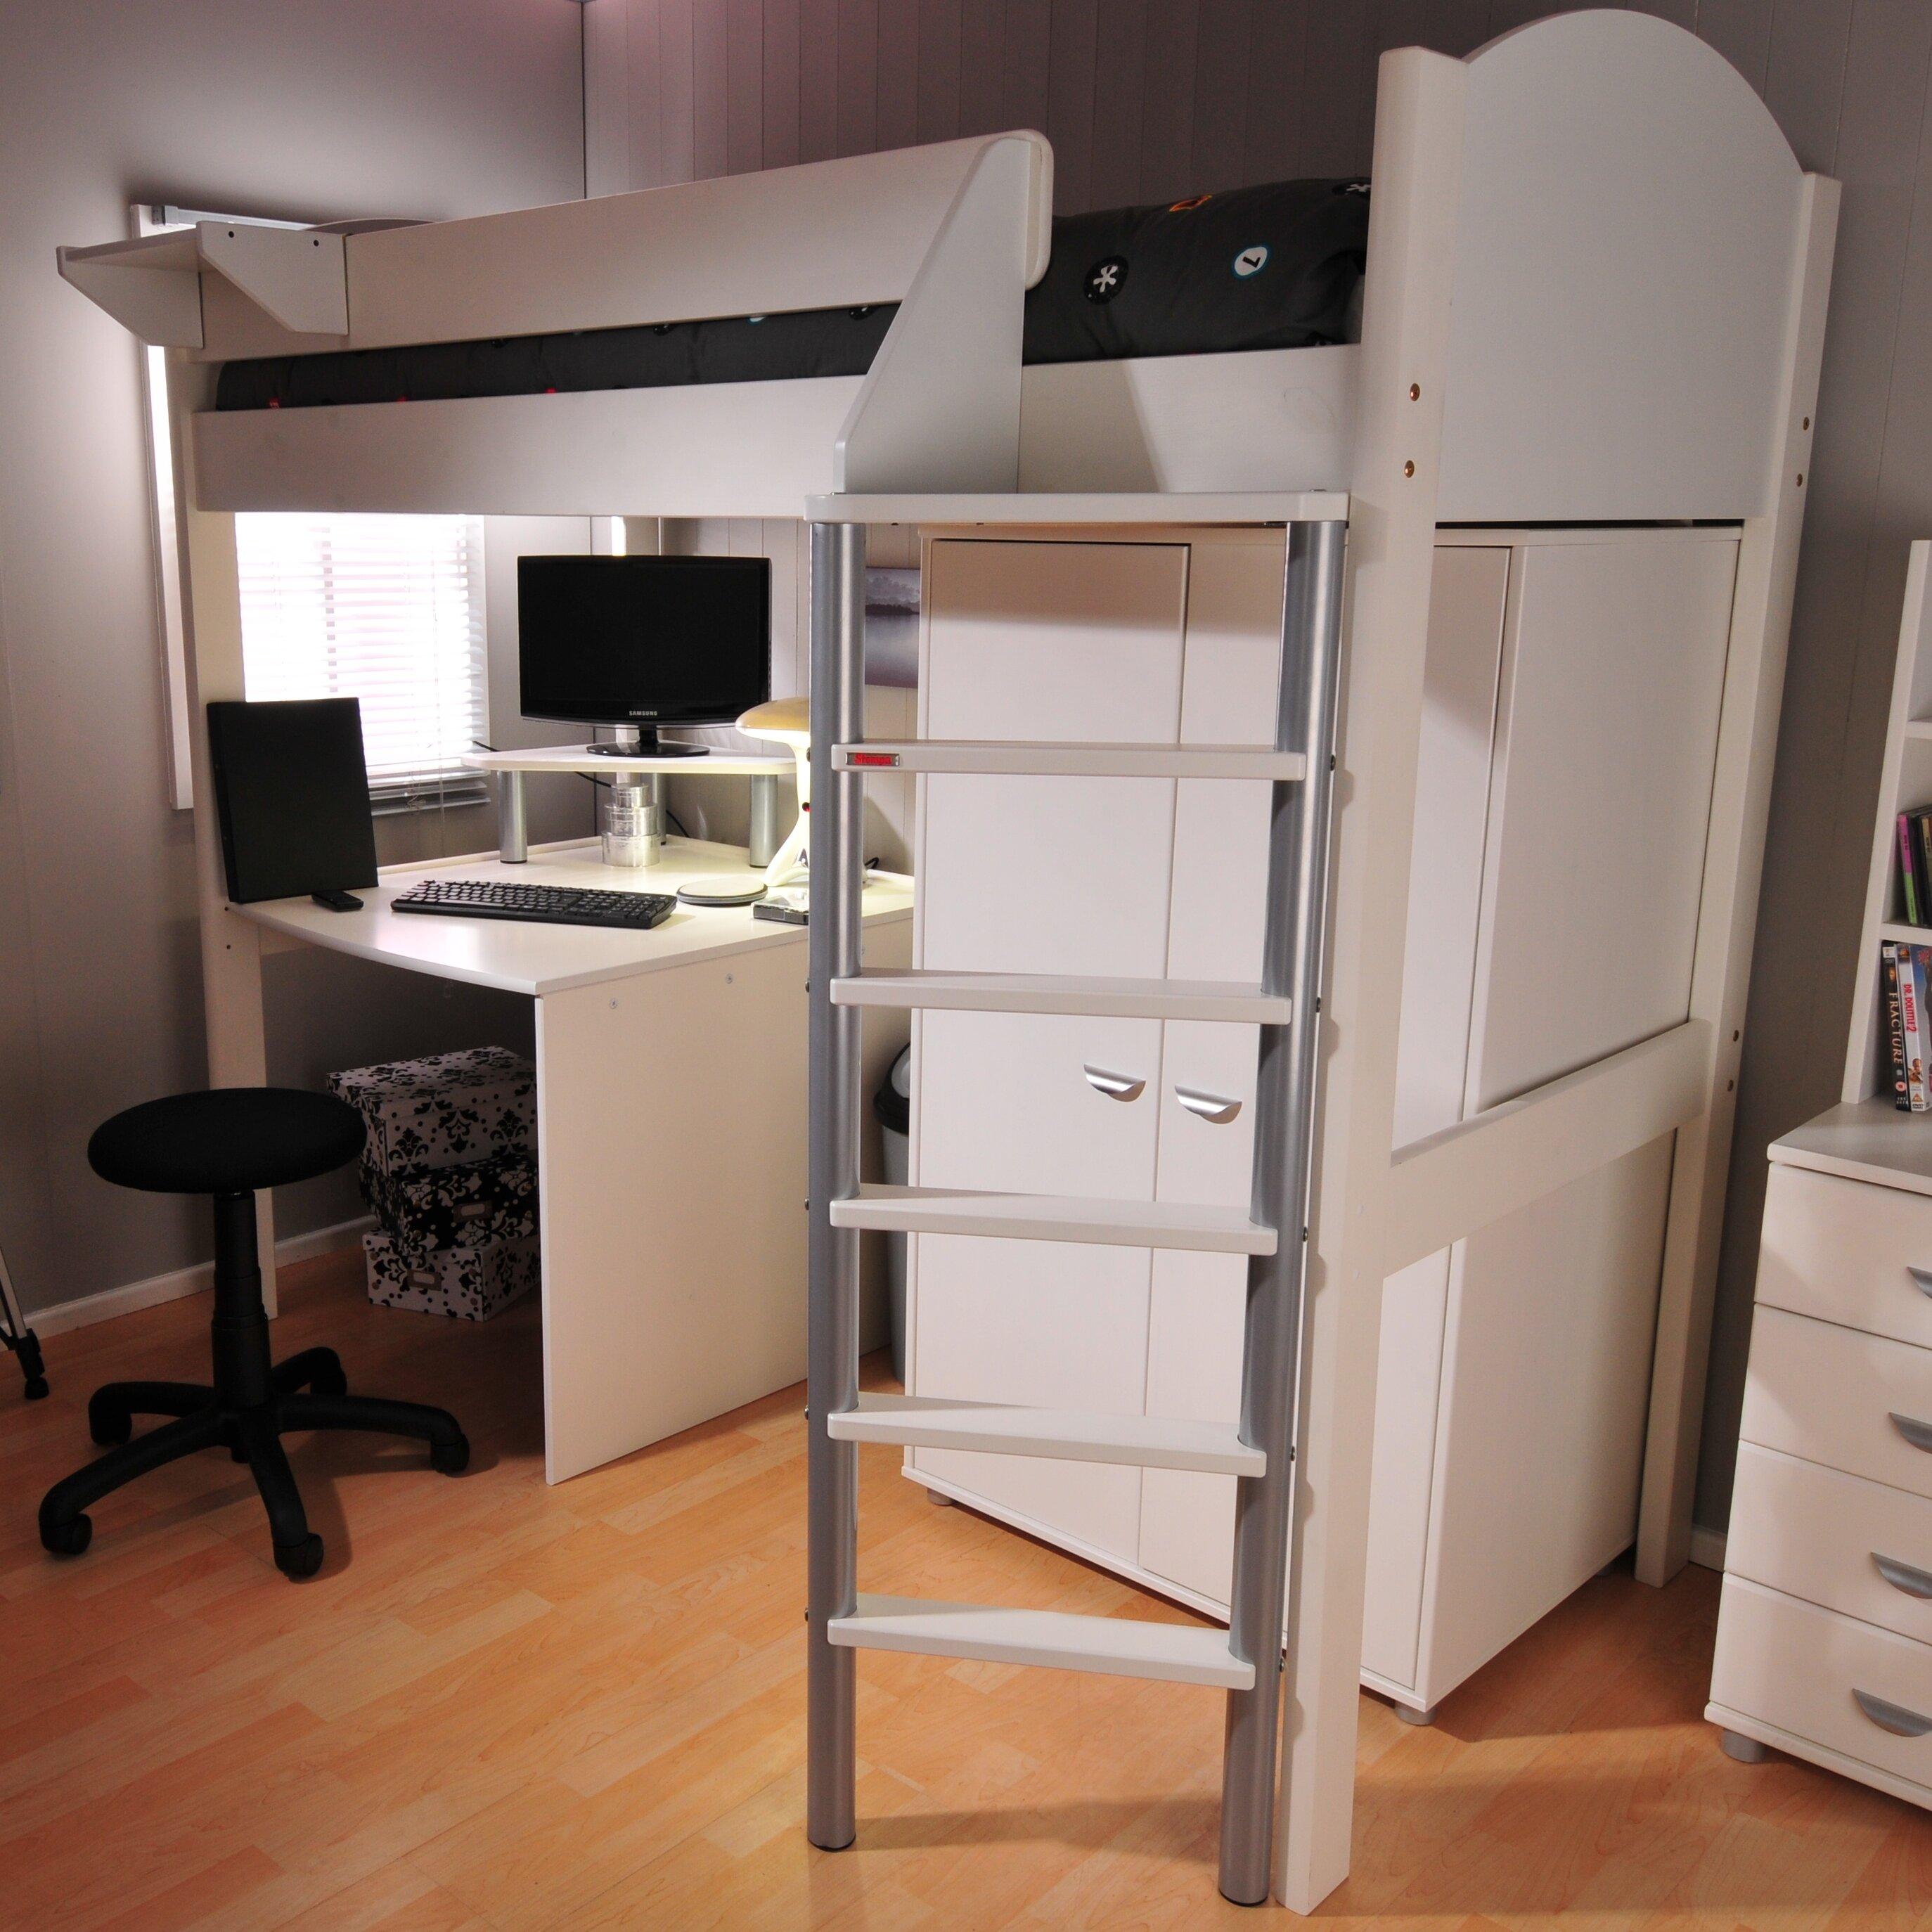 e1f957183c8d Stompa Casa European Single High Sleeper Bed with Storage | Wayfair.co.uk